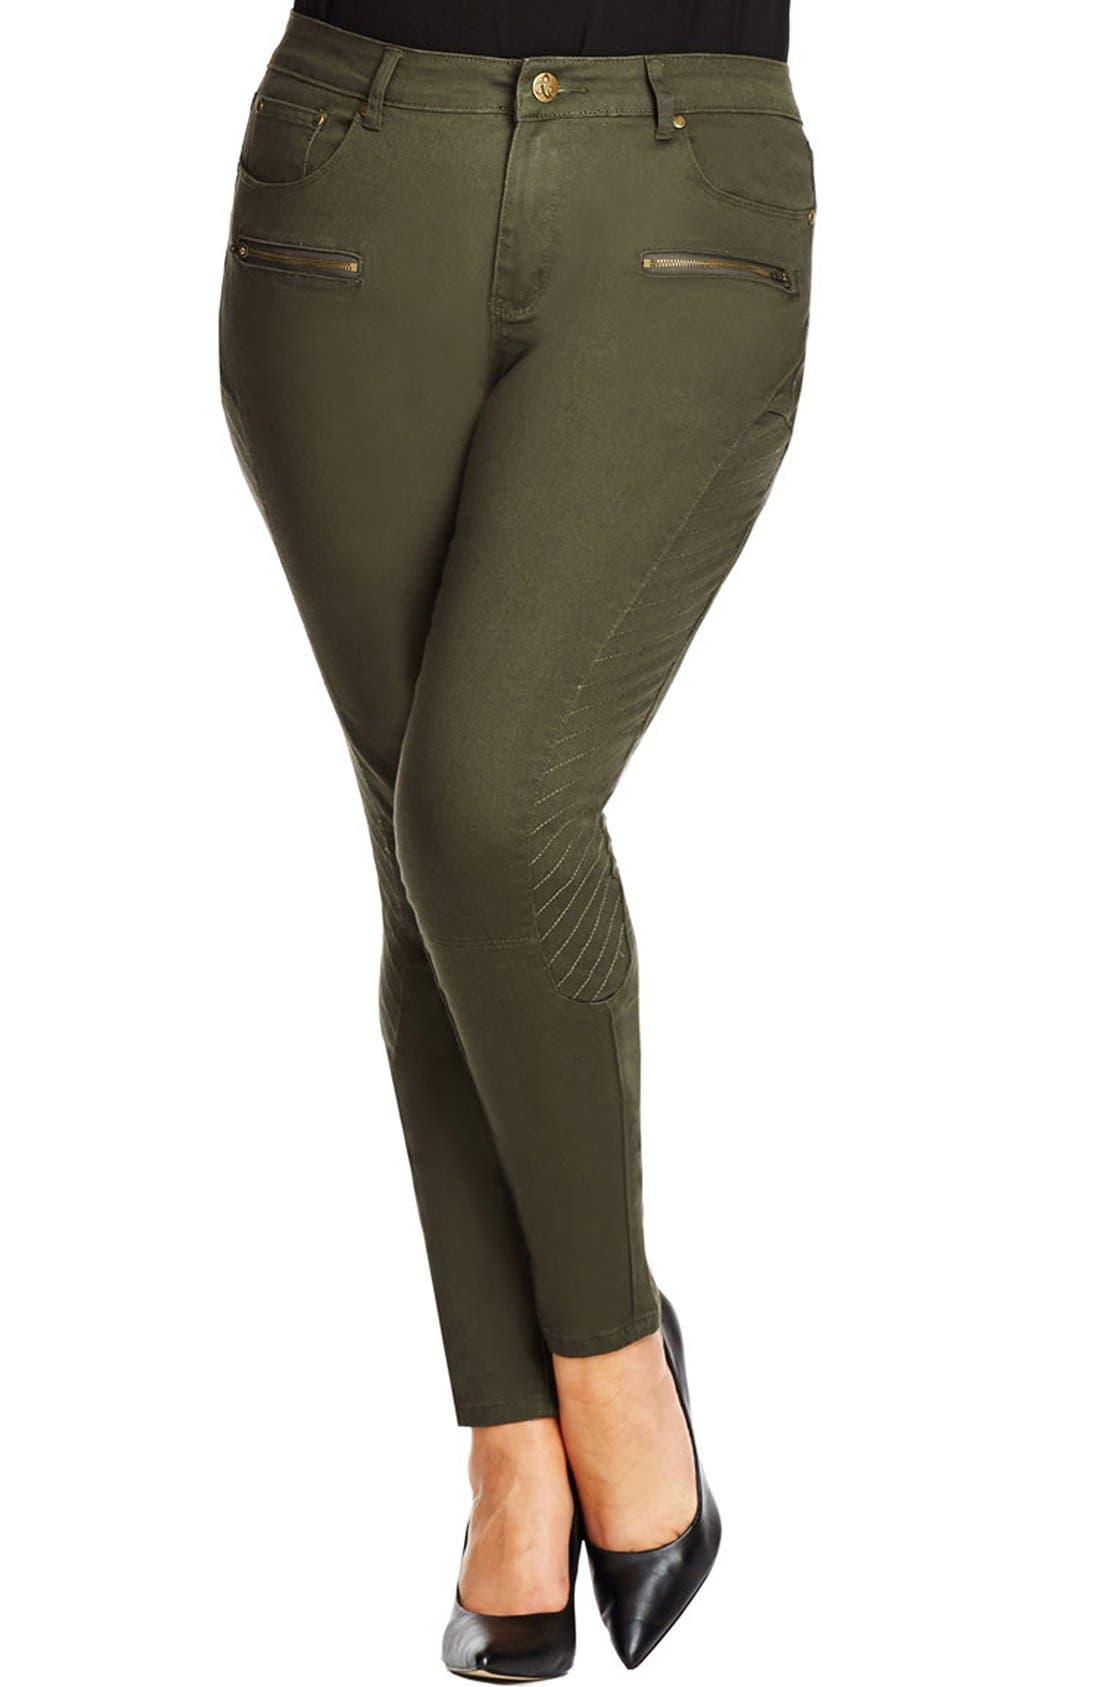 Alternate Image 1 Selected - City Chic 'Commando' Khaki Pants (Plus Size)